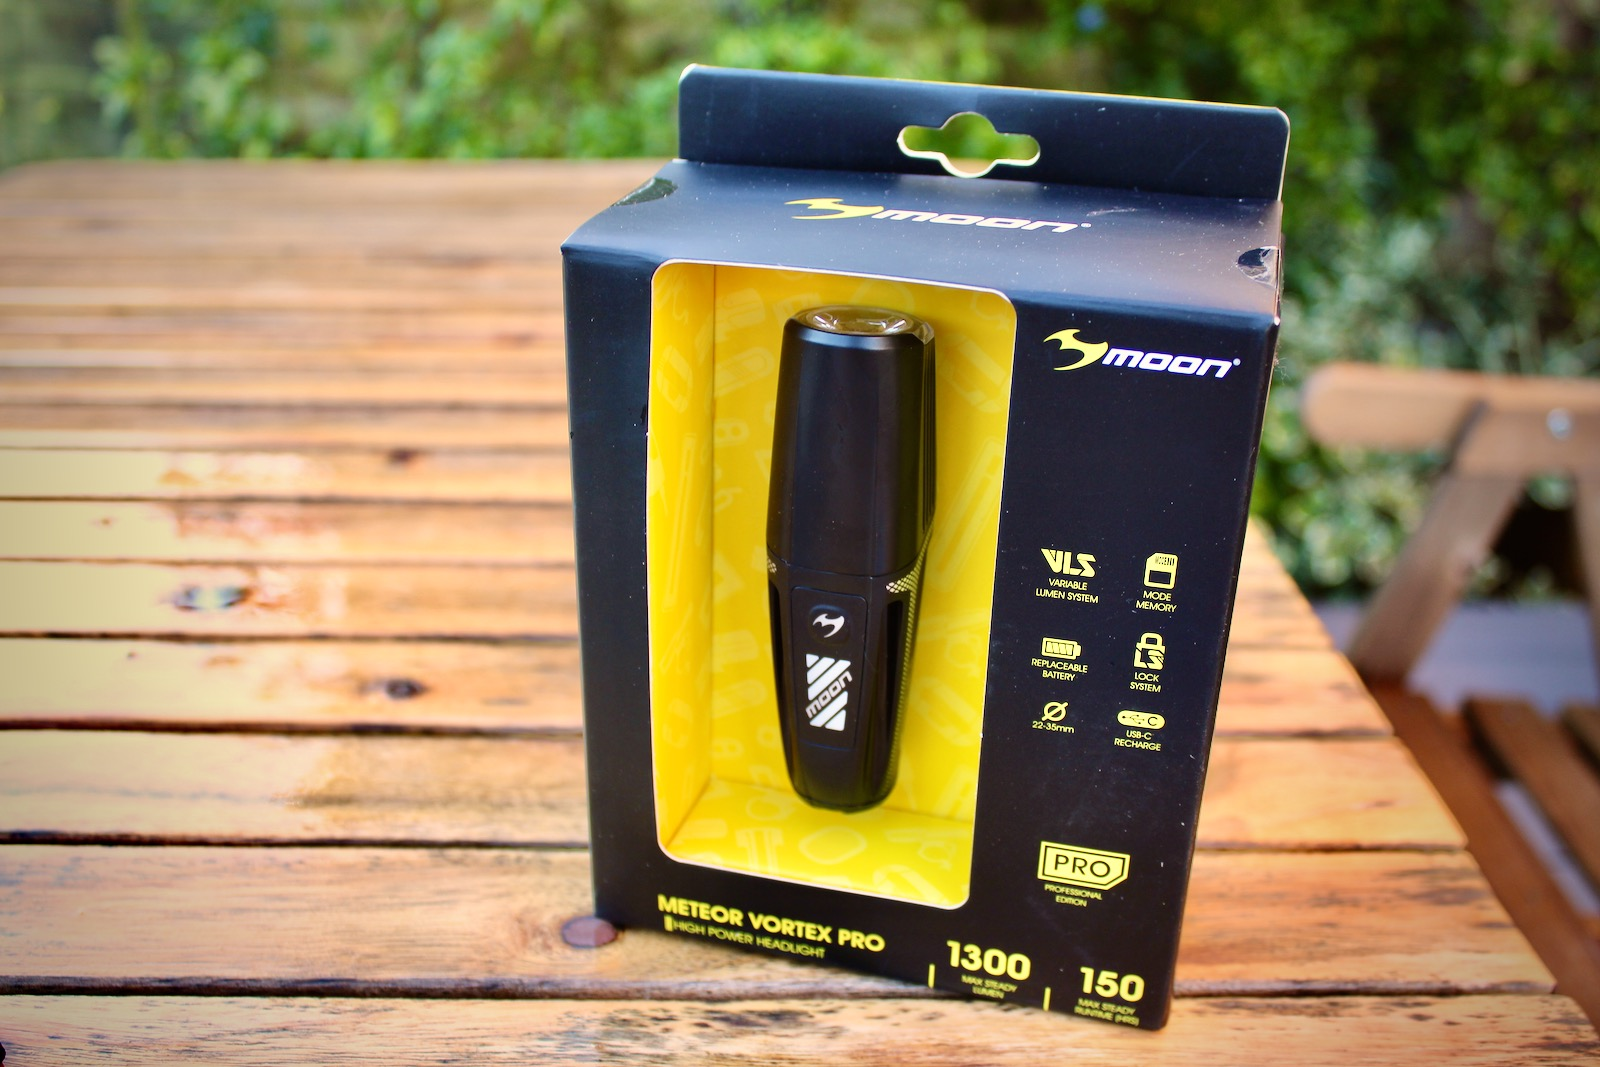 Moon Sport Vortex Pro Front Bike Light